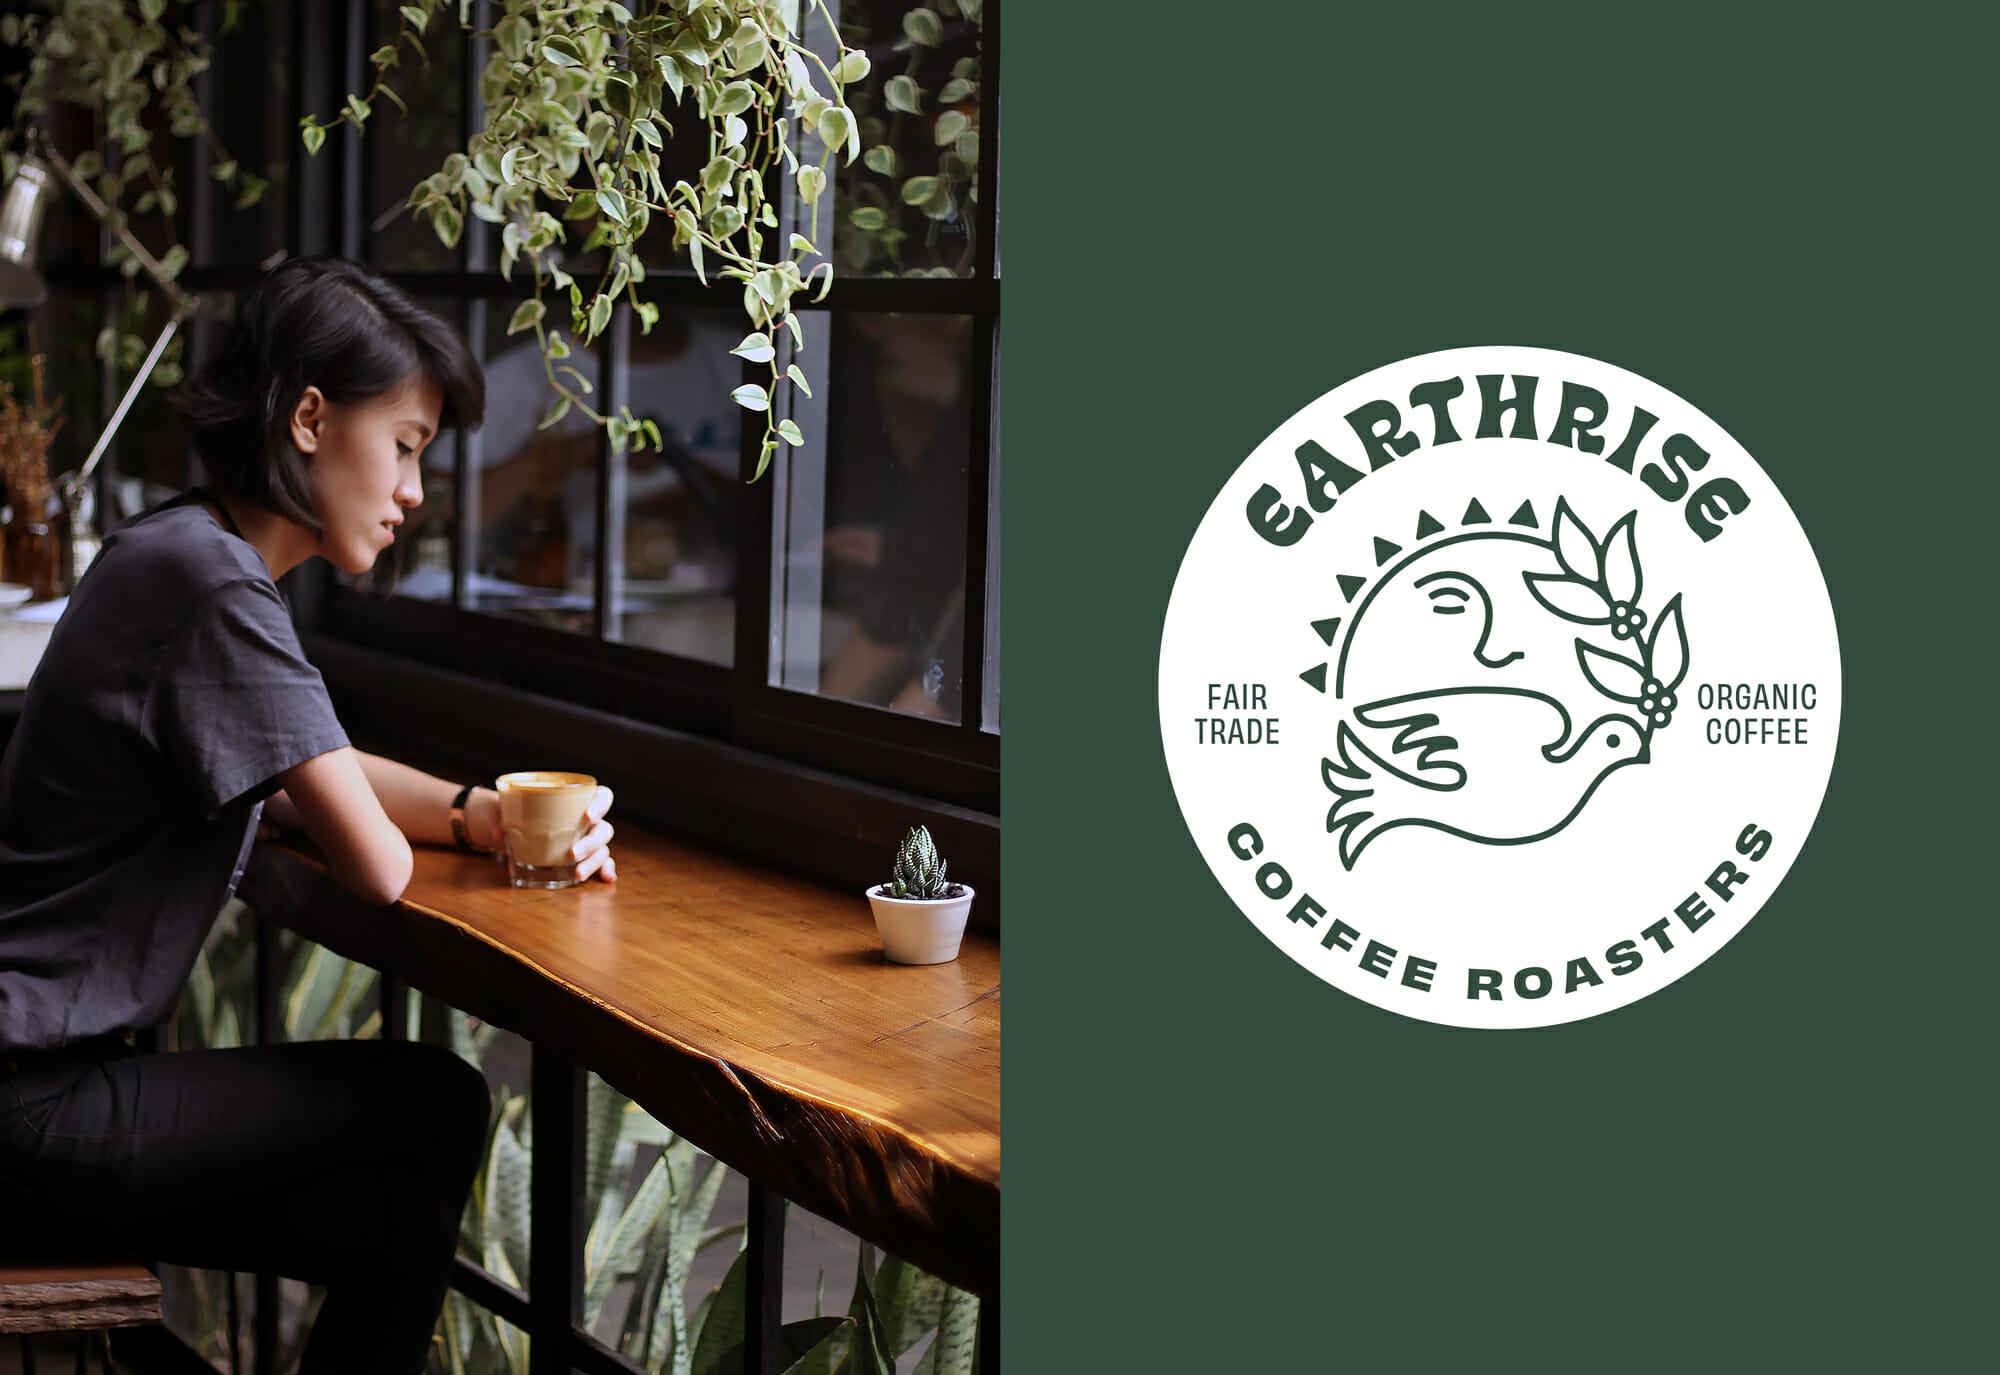 Earthrise Coffee Roasters Branding and Typography Badge